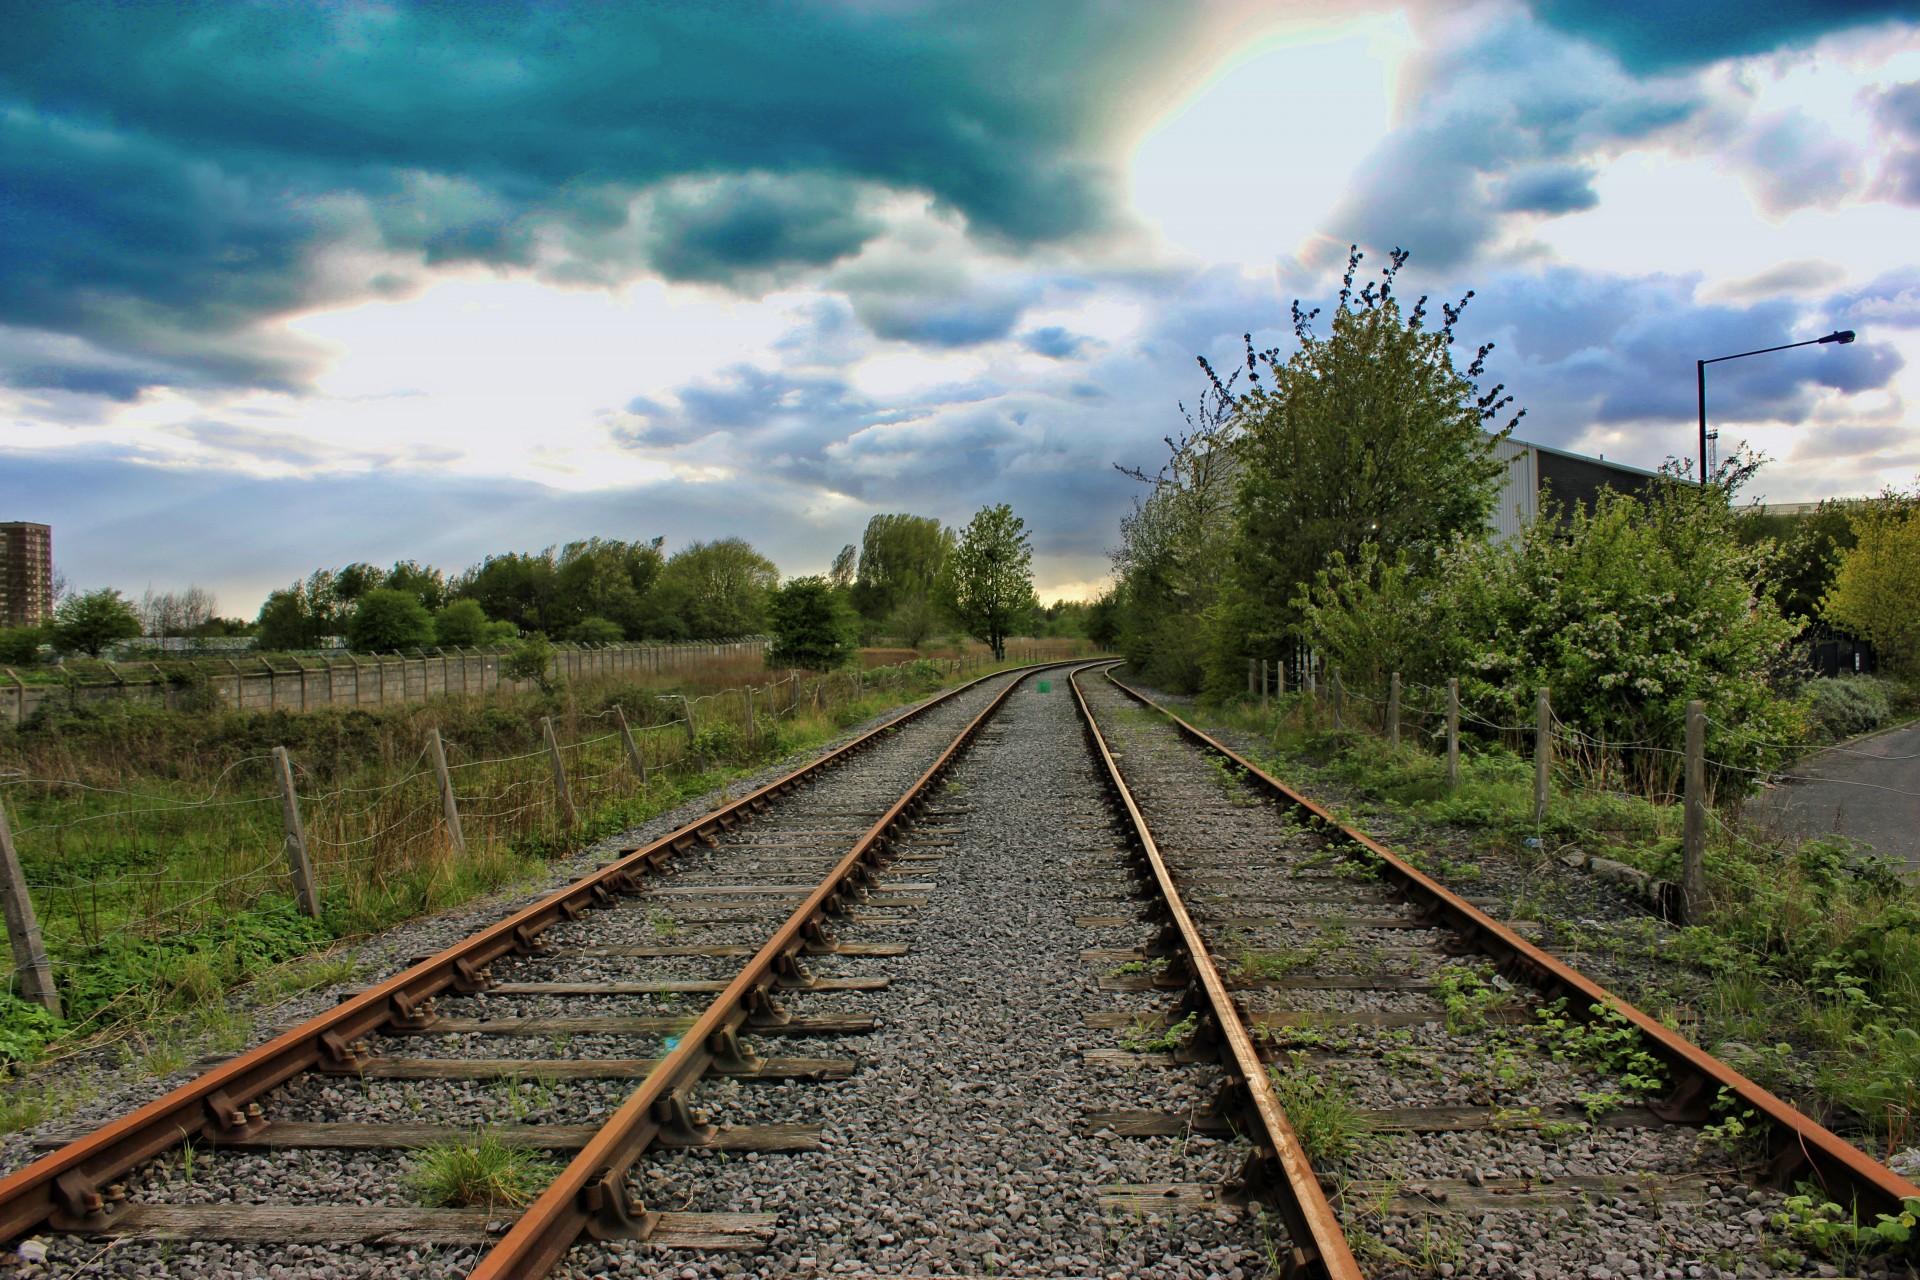 Blue Sky 3d Wallpaper Train Tracks Abandoned Free Stock Photo Public Domain